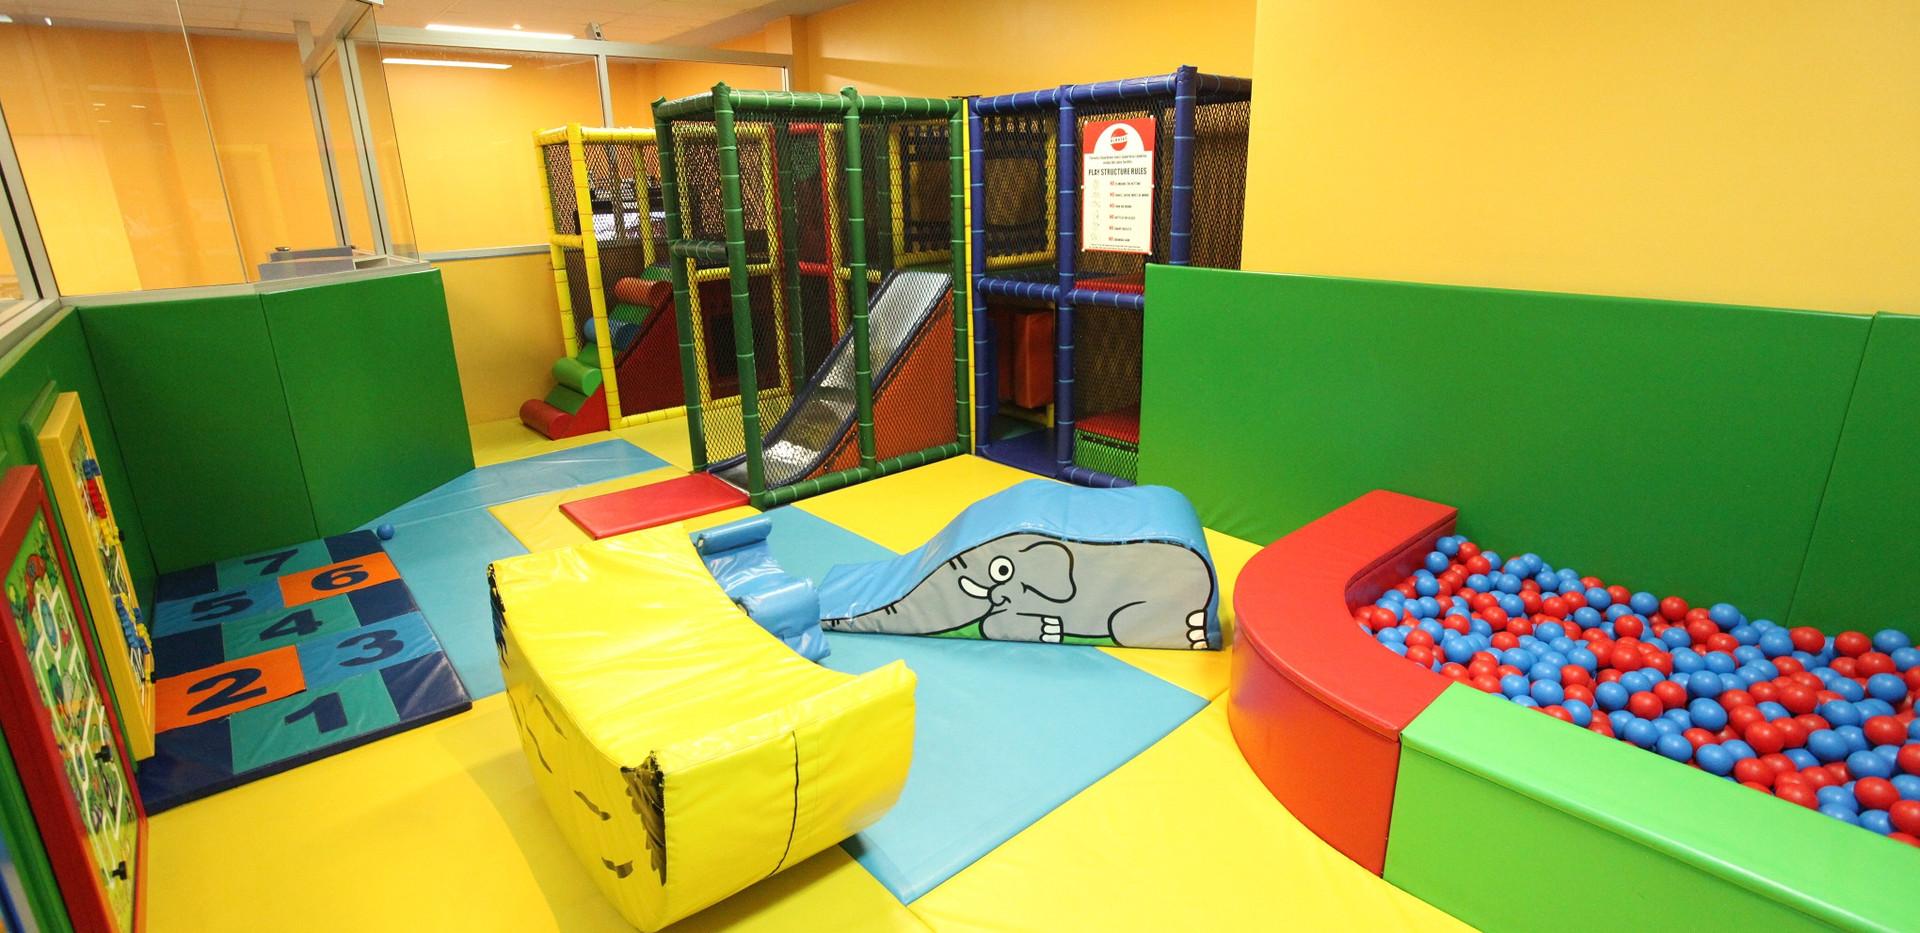 Workies Wizards Kids Room Soft Play Area